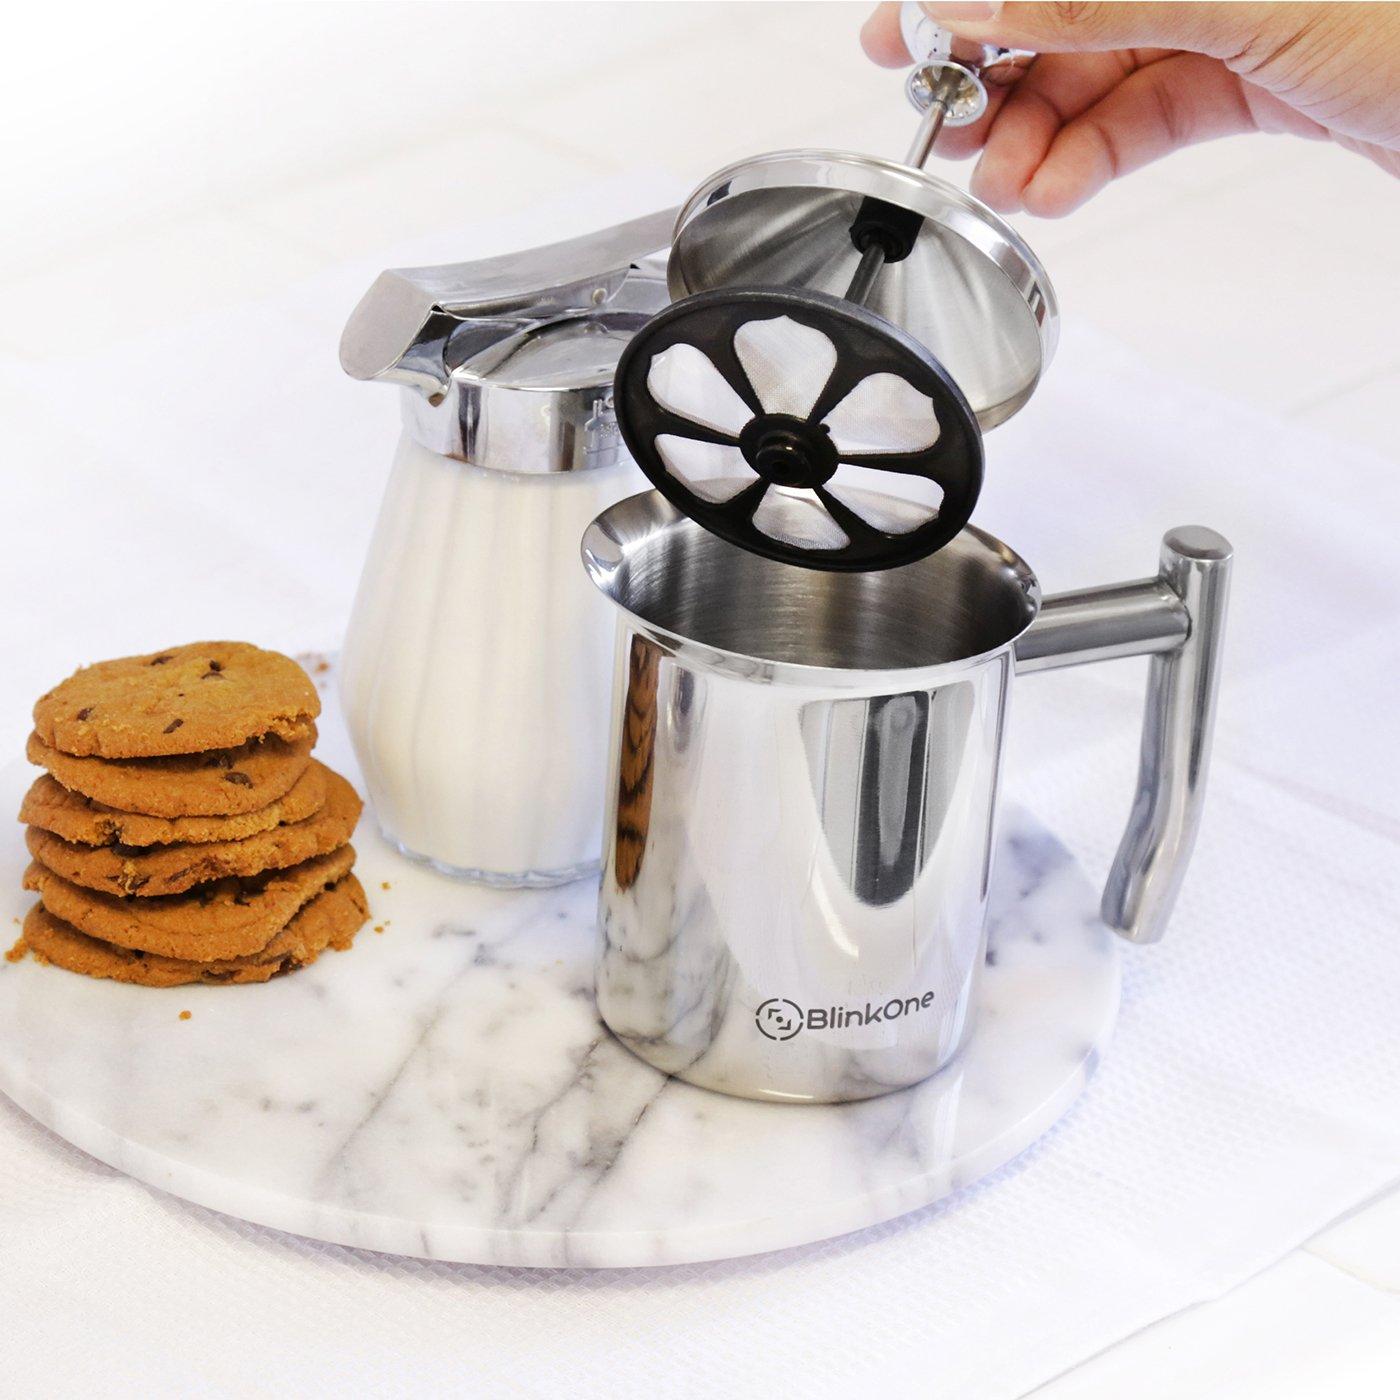 Vaporera y funciona con manual Foamer espumador de leche blinkone: doble malla; respetuoso con el café (14 oz)): Amazon.es: Hogar